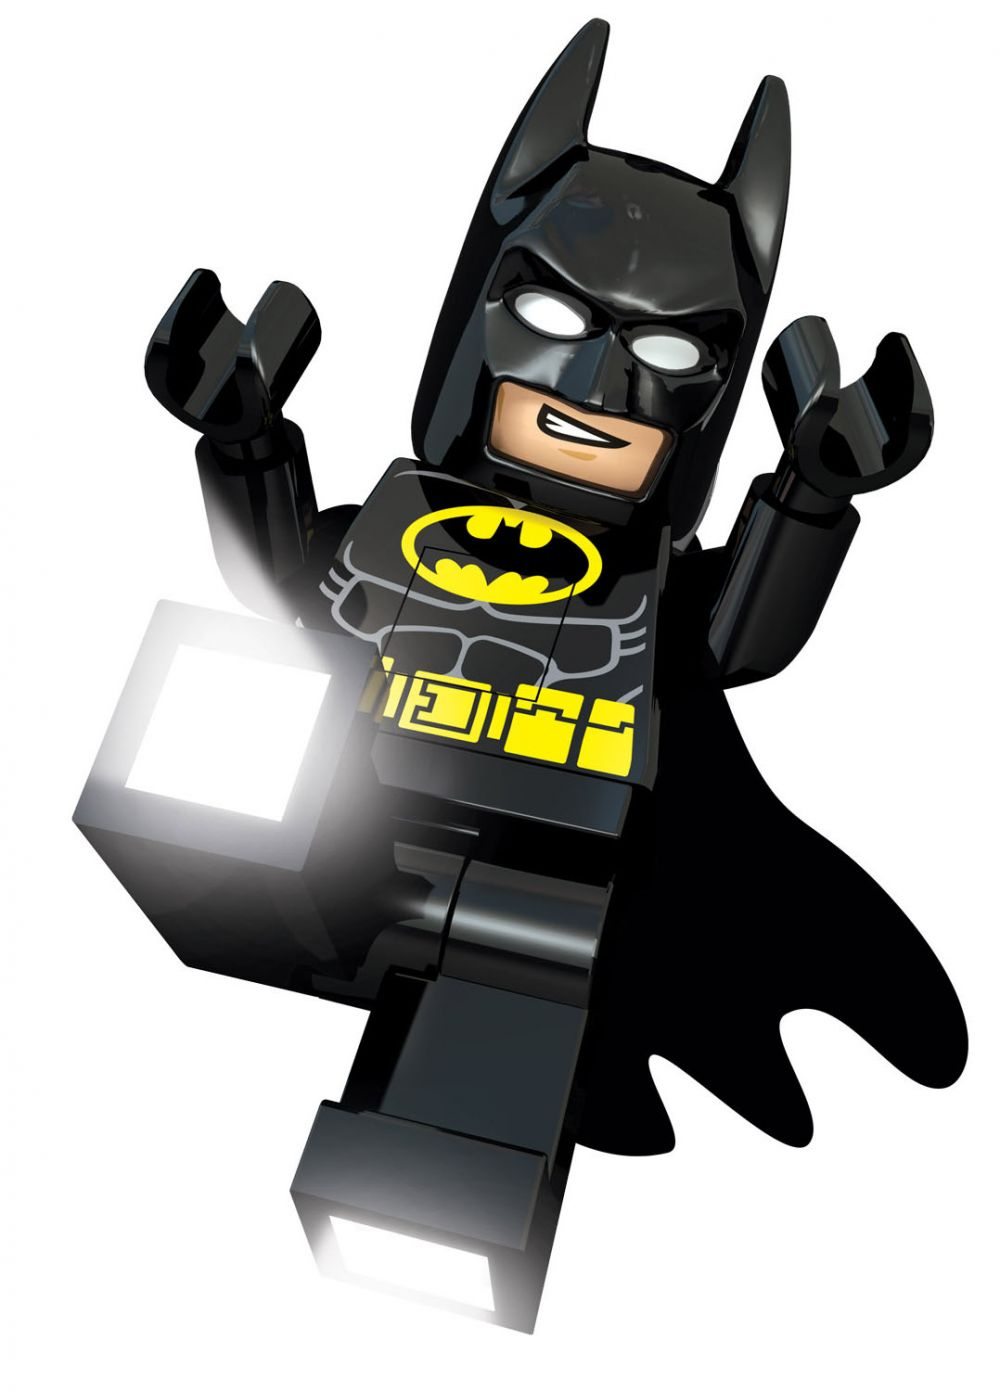 Lego lampes lgtob12t pas cher lampe torche lego batman for Videos de lego batman